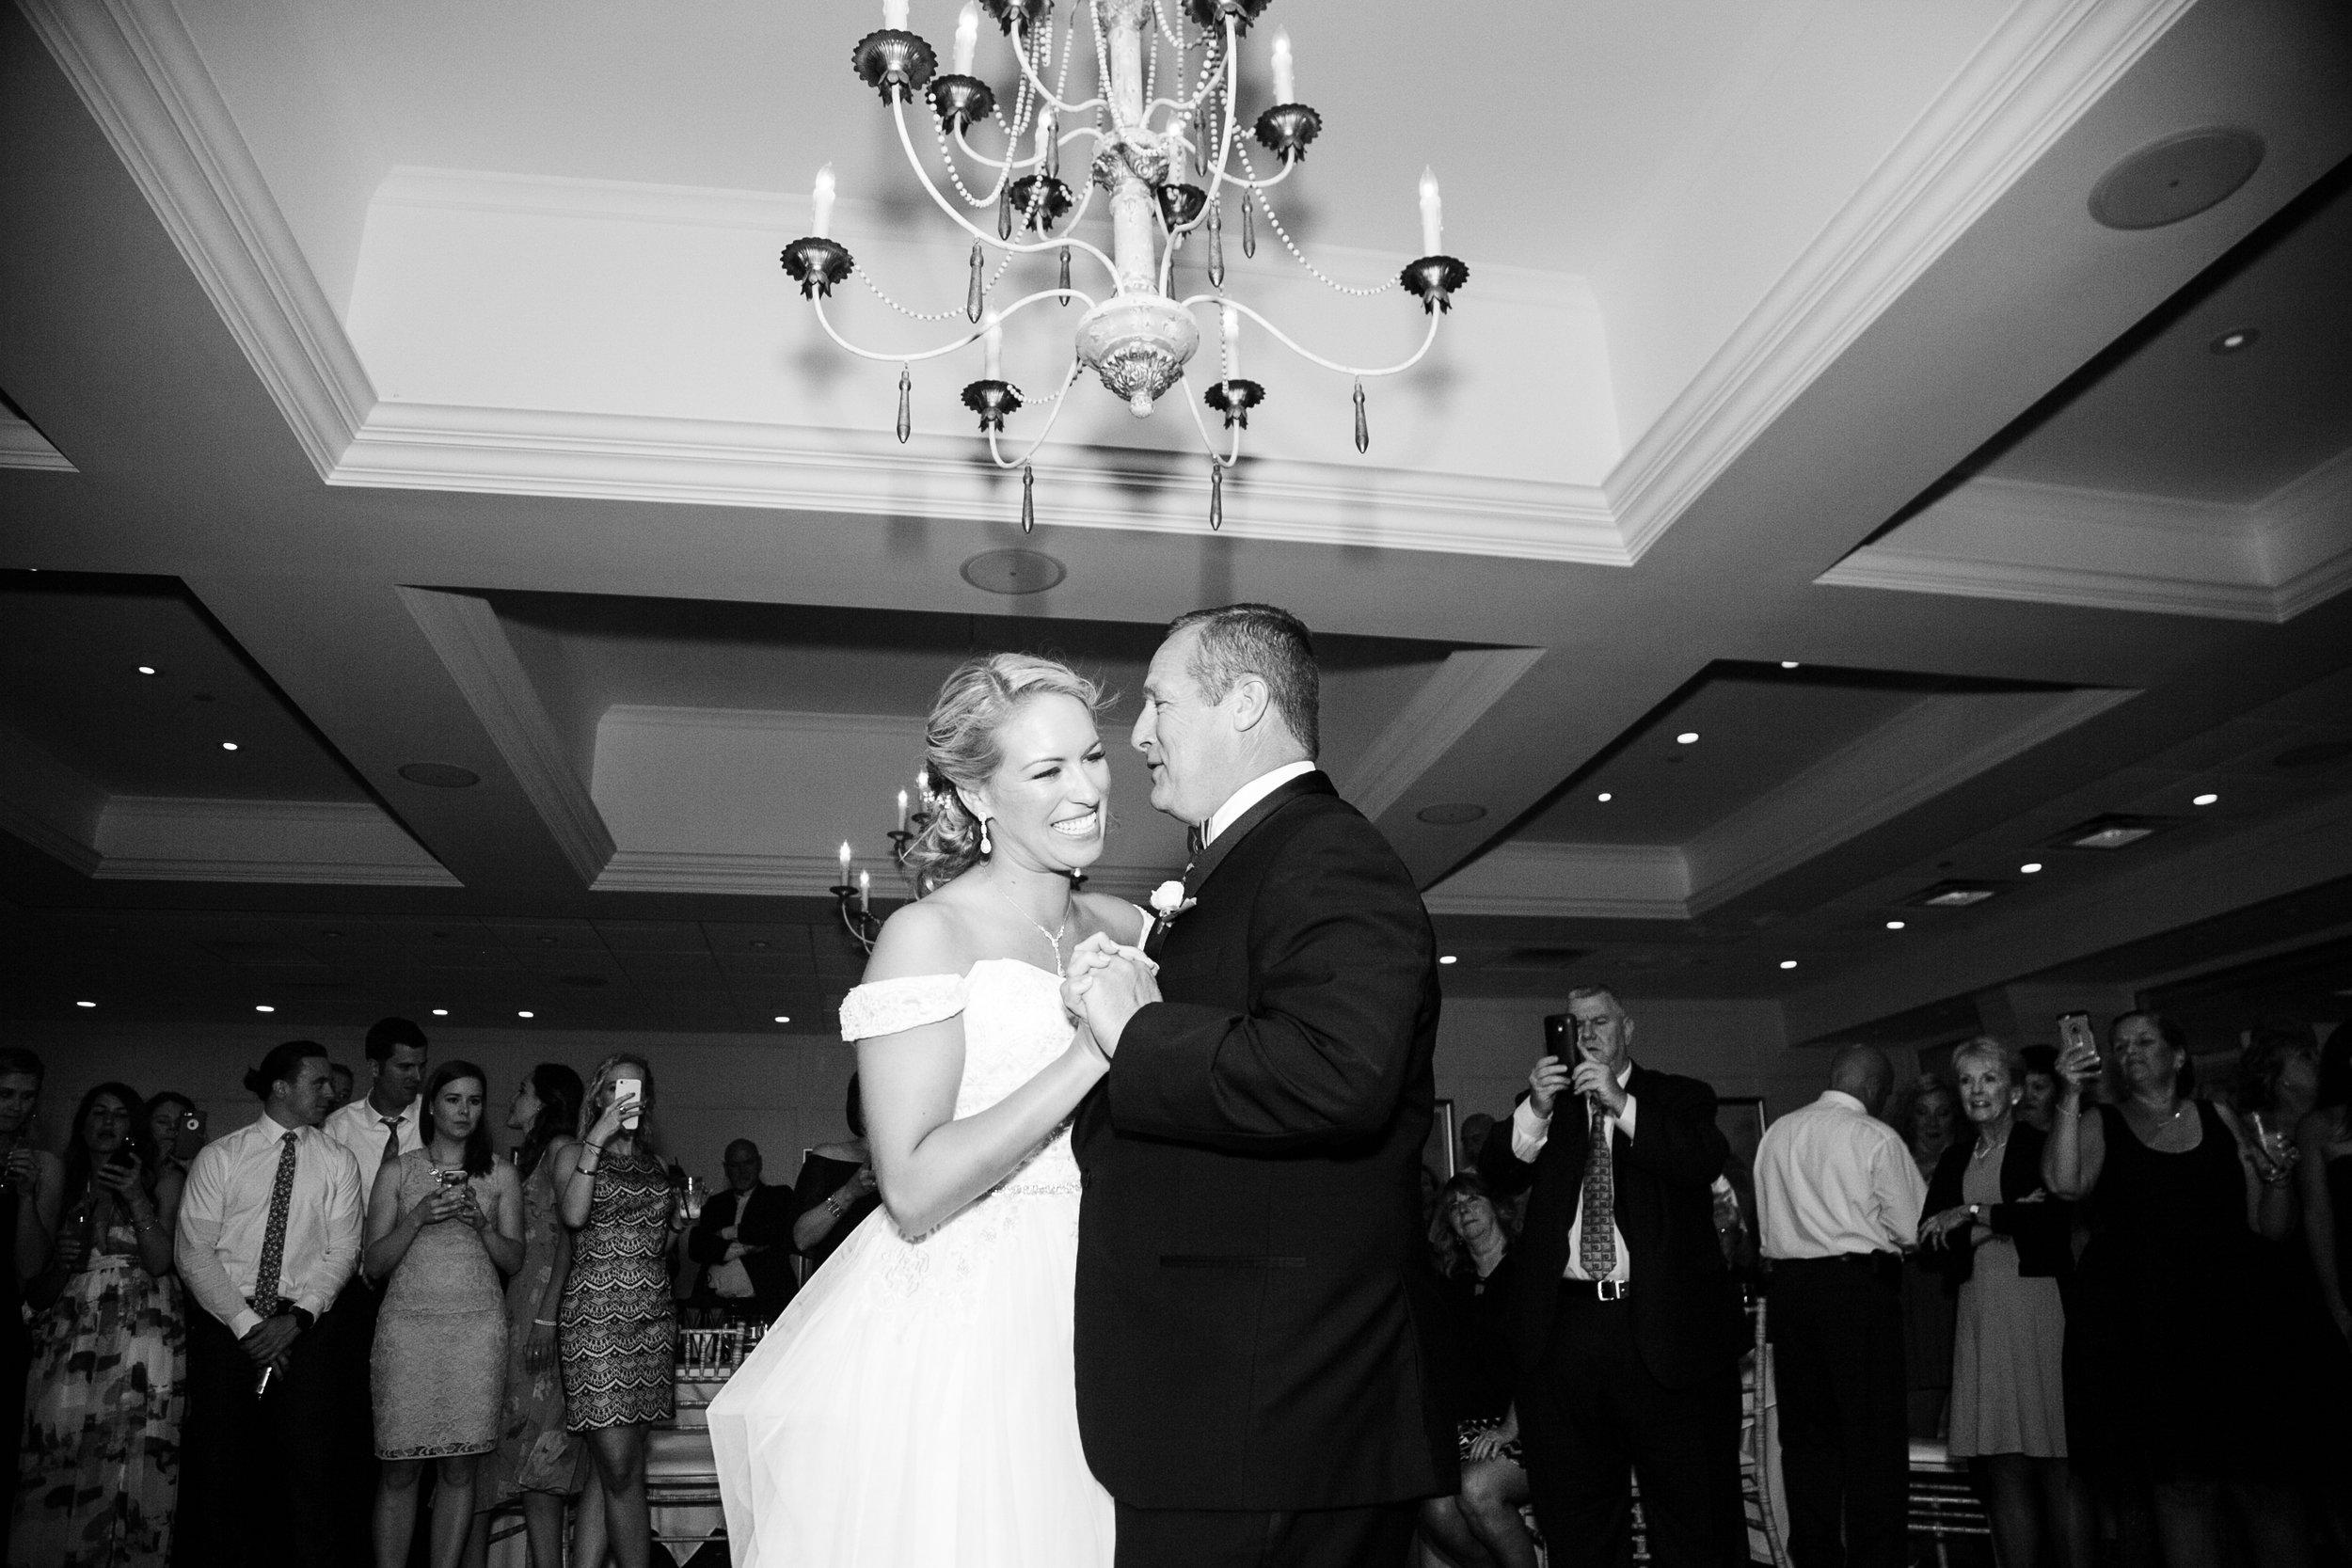 ICONA GOLDEN INN AVALON NJ WEDDING PHOTOGRAPHY  - 088.jpg